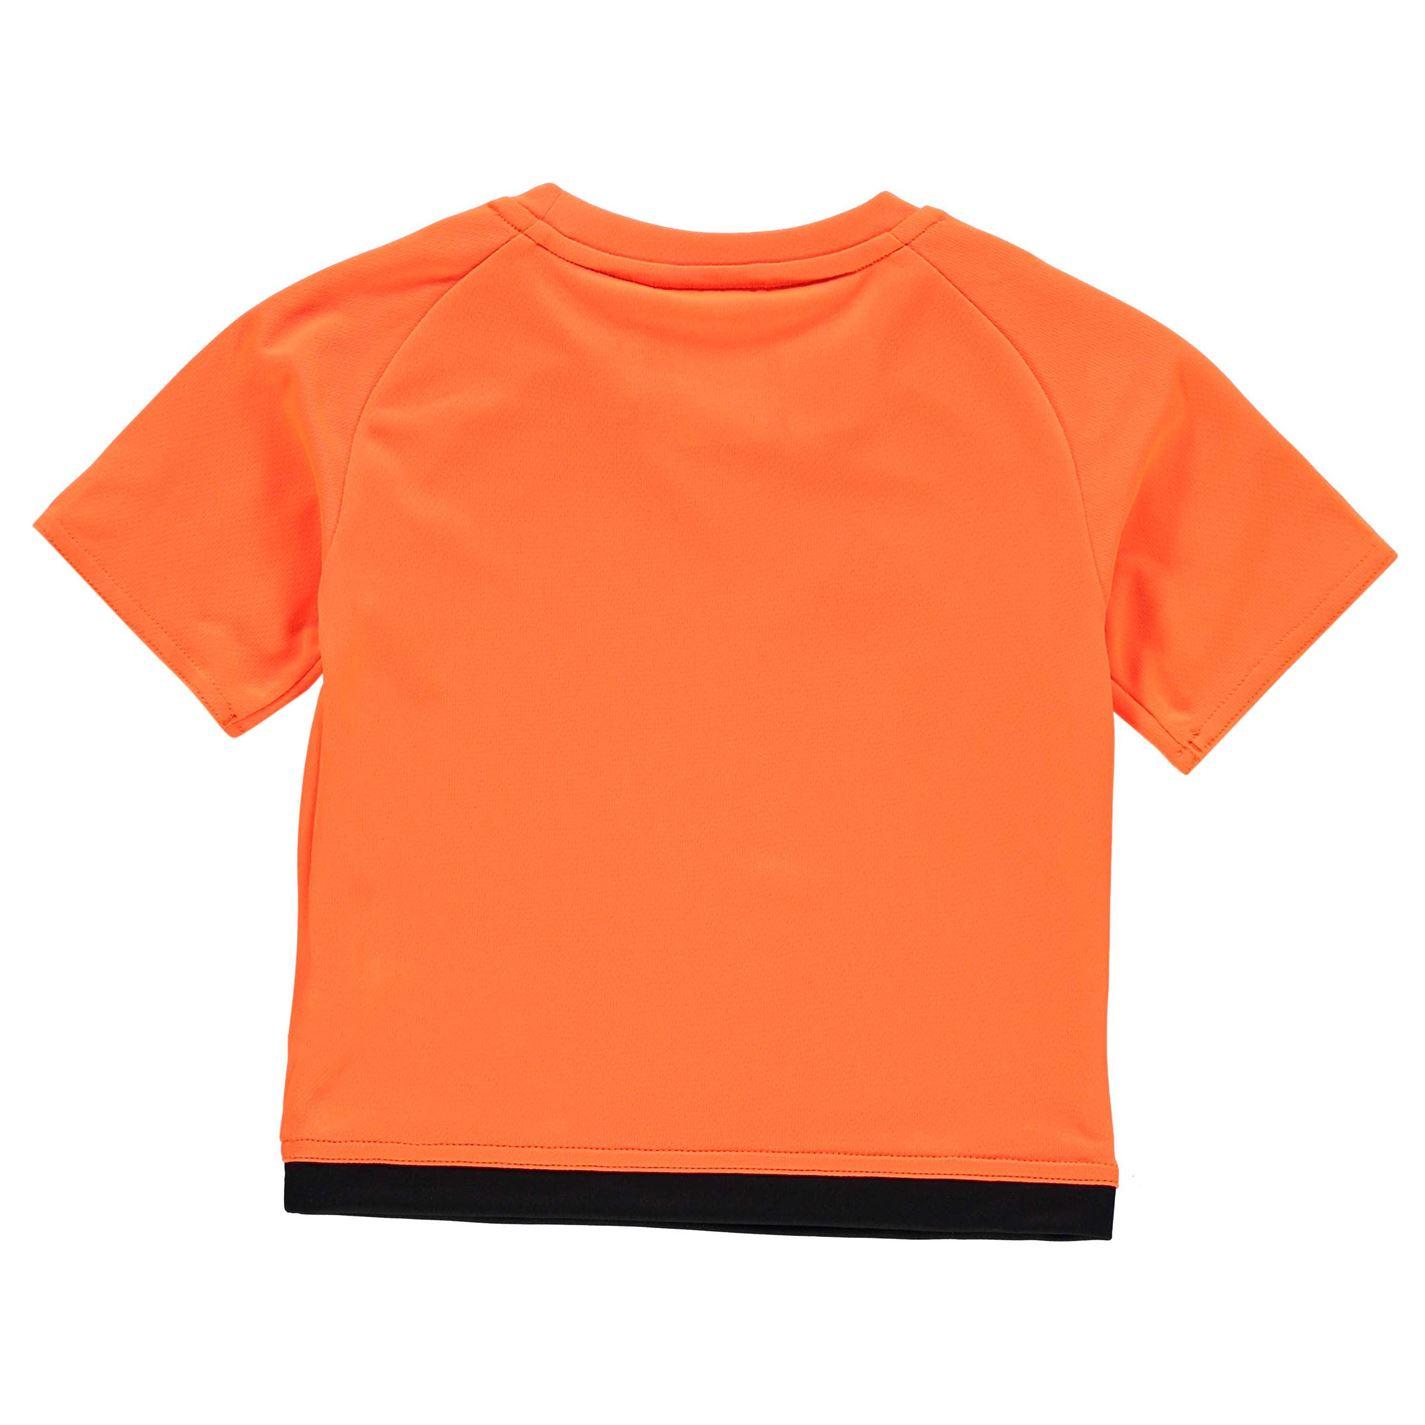 3 Stripe About Neck Kids Details Infant T Estro Boys Tee Climalite Top Adidas Shirt Crew rCthQdsx